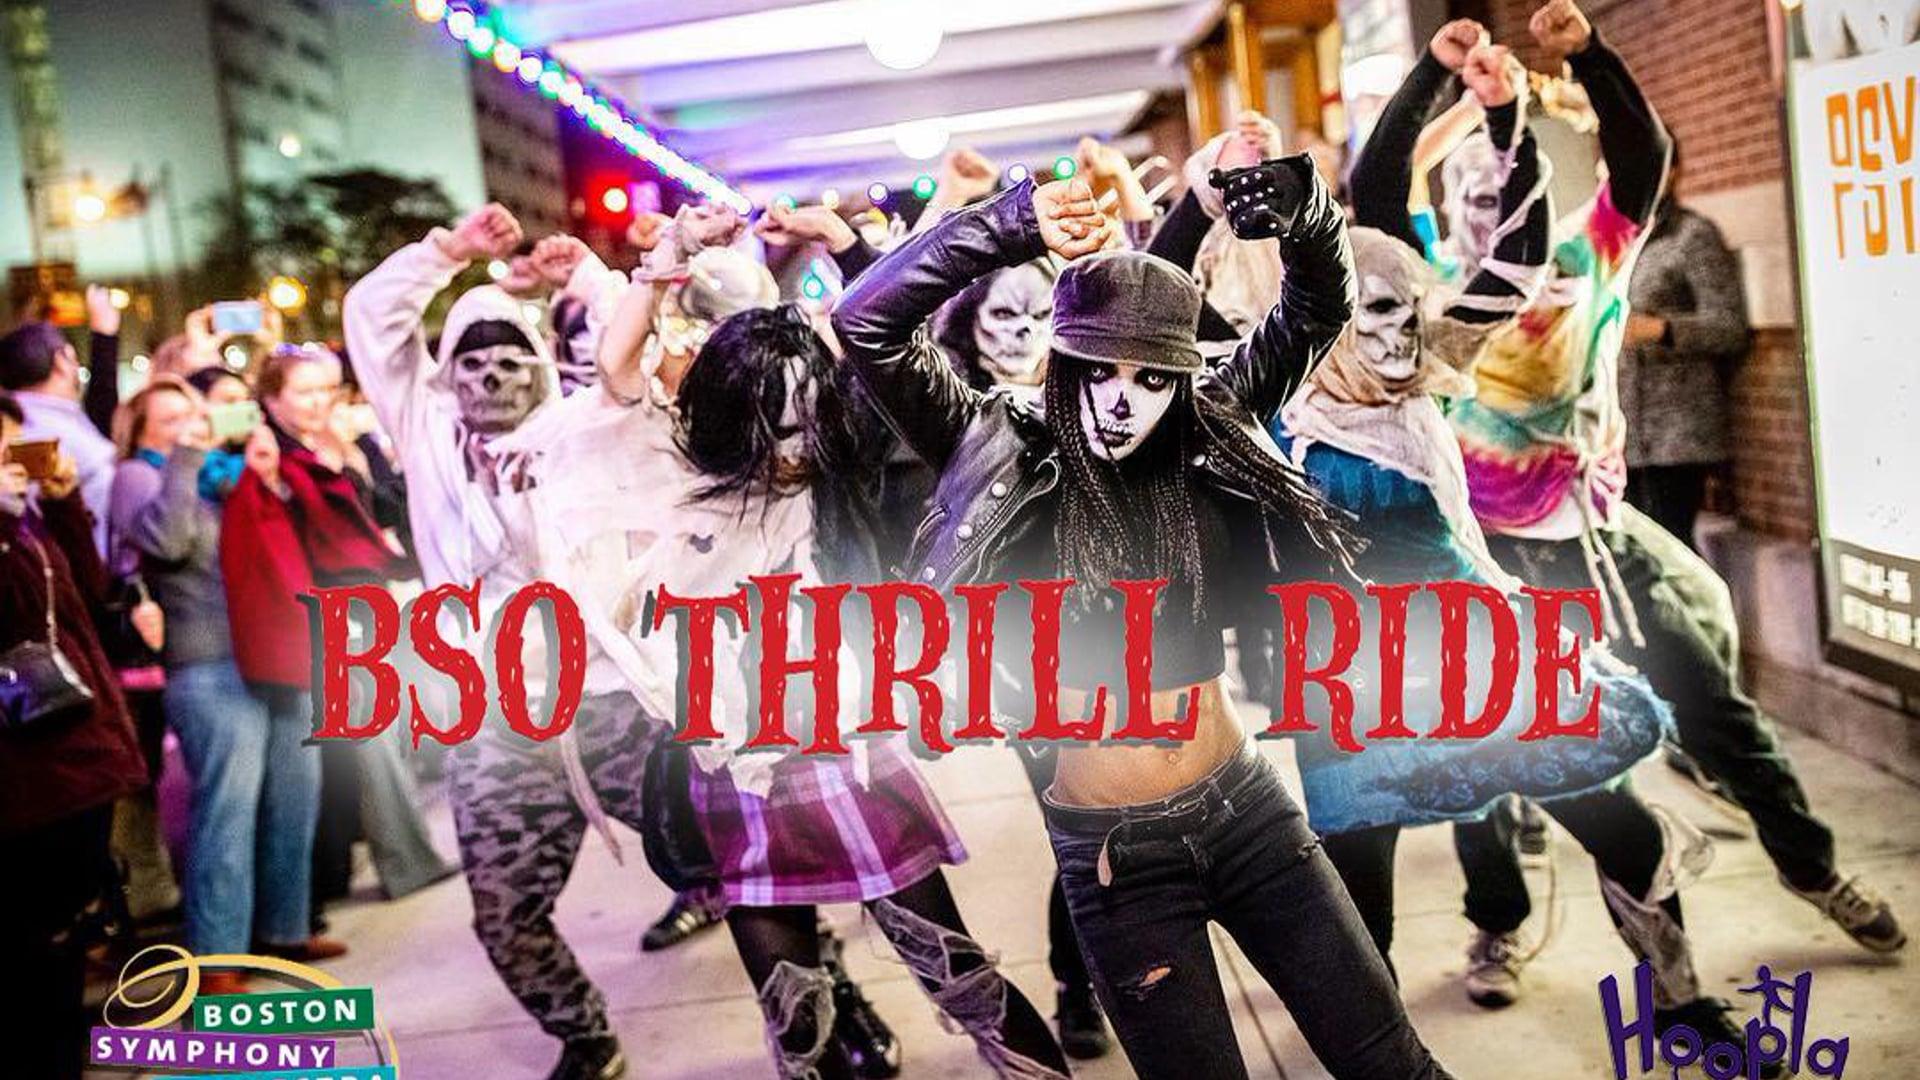 BSO Thrill Ride | Halloween Flashmob